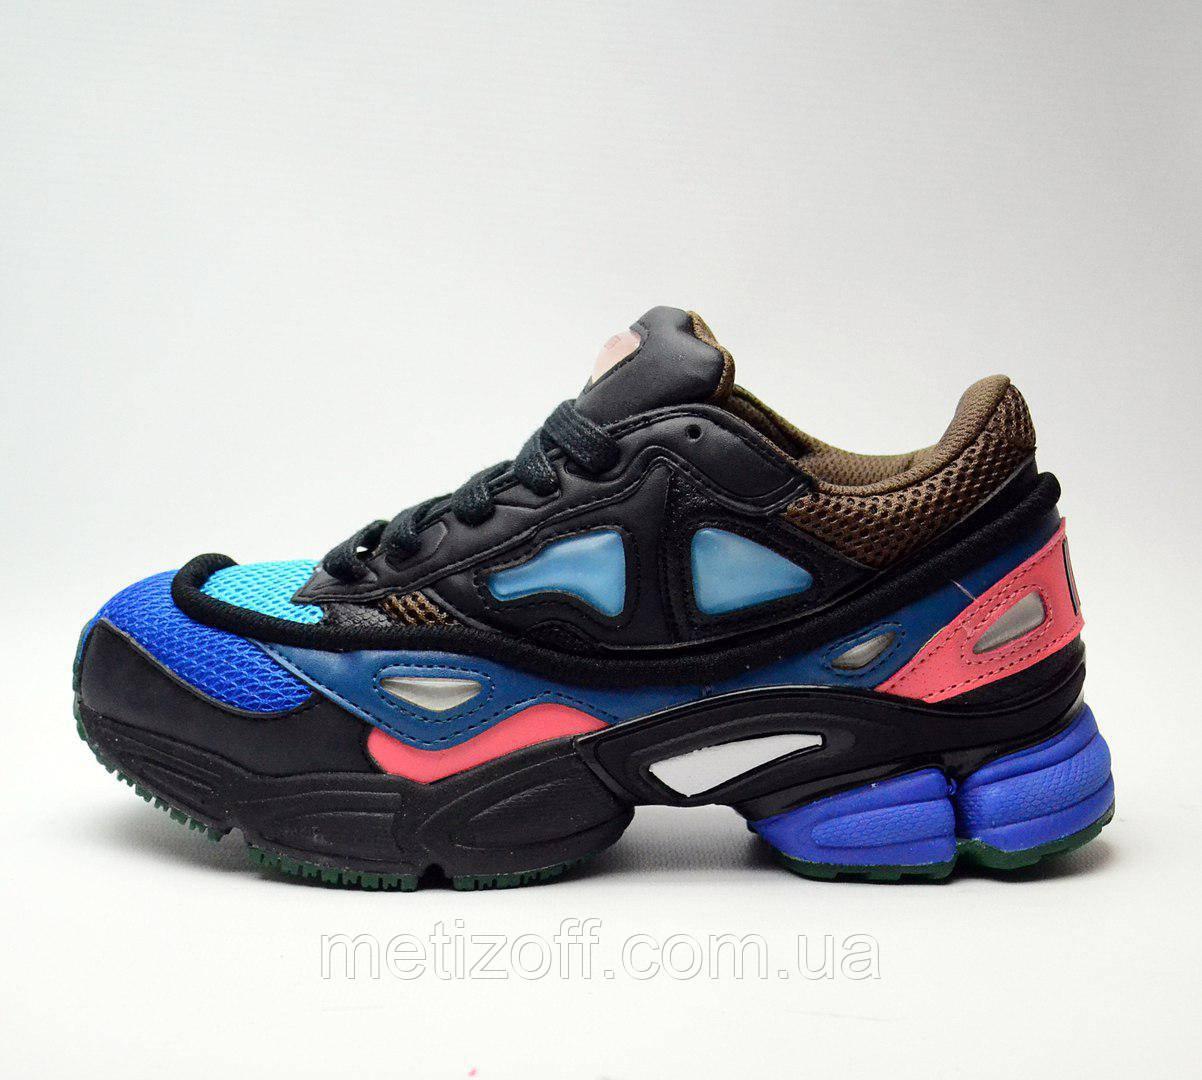 20b310f59a19 Кроссовки Adidas x Raf Simons Ozweego II  продажа, цена в Днепре. беговые  кроссовки от